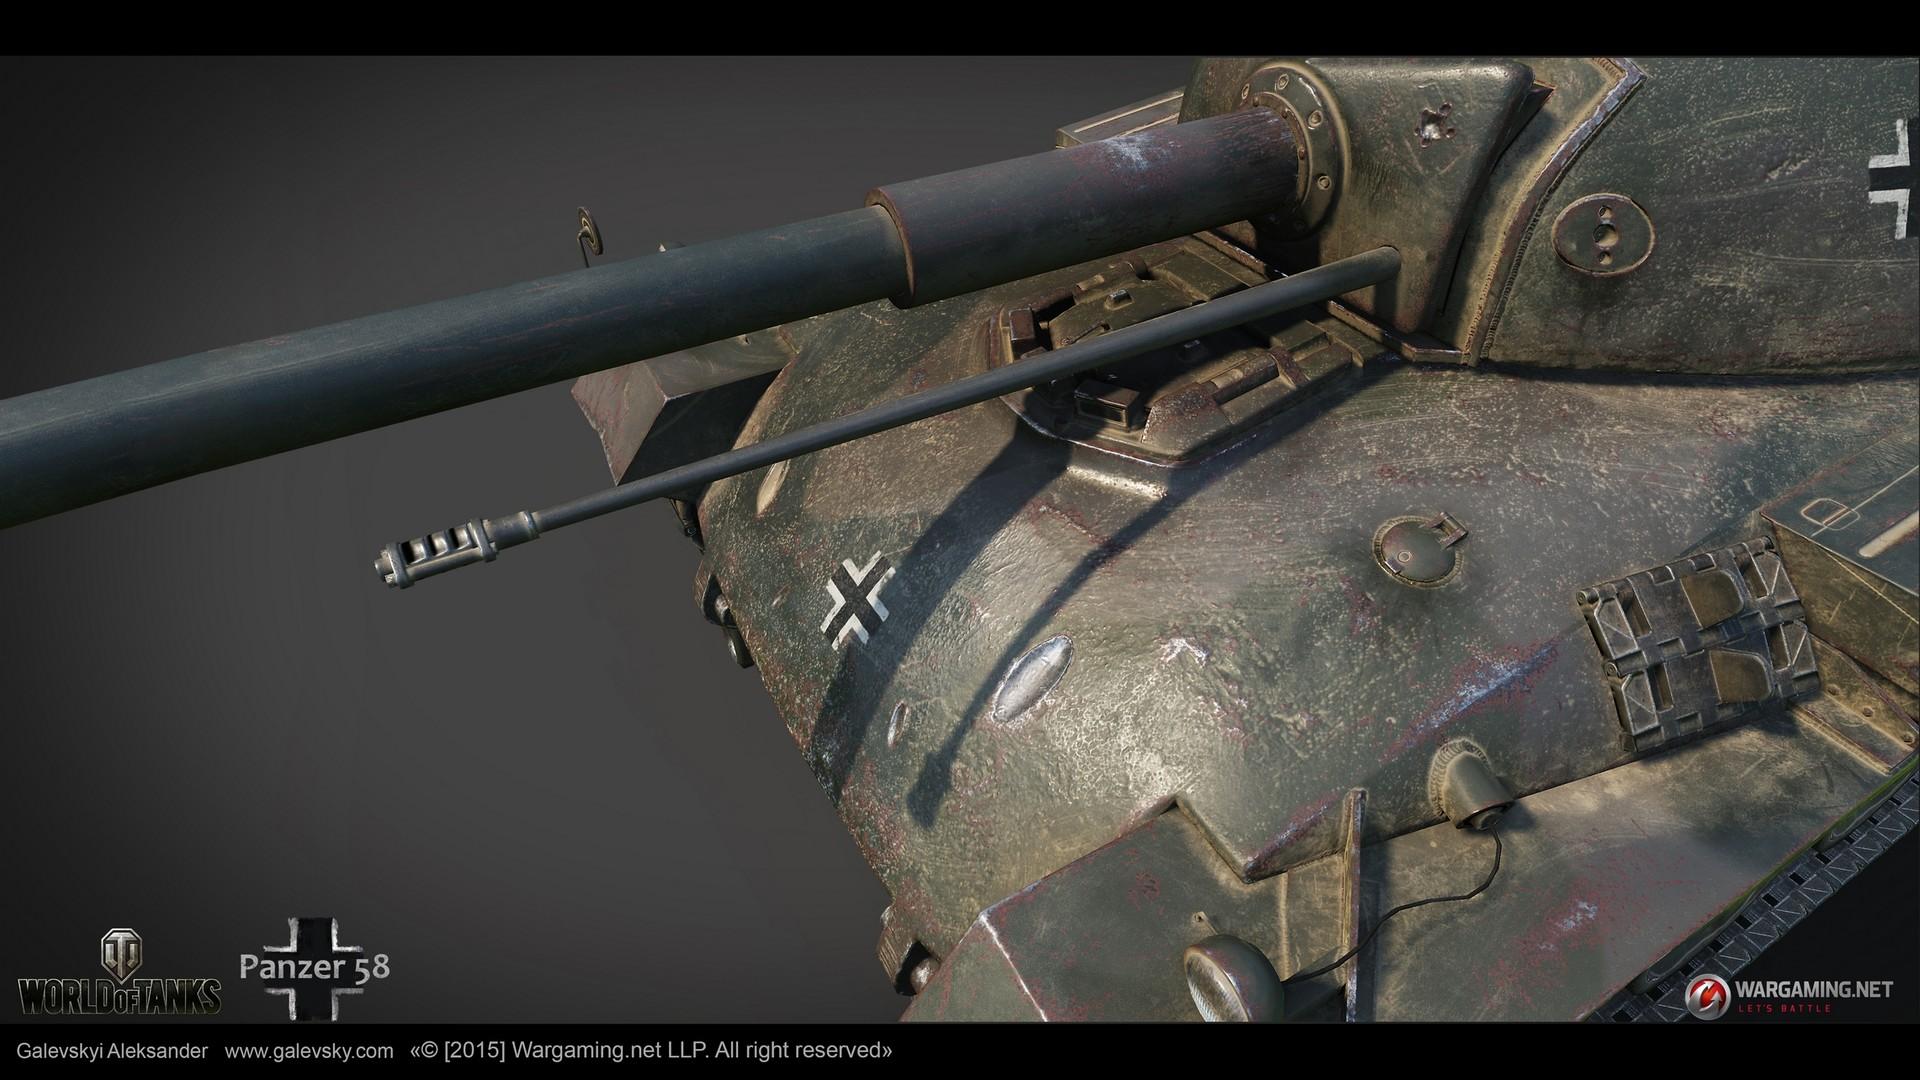 Aleksander galevskyi panzer 58 08 med